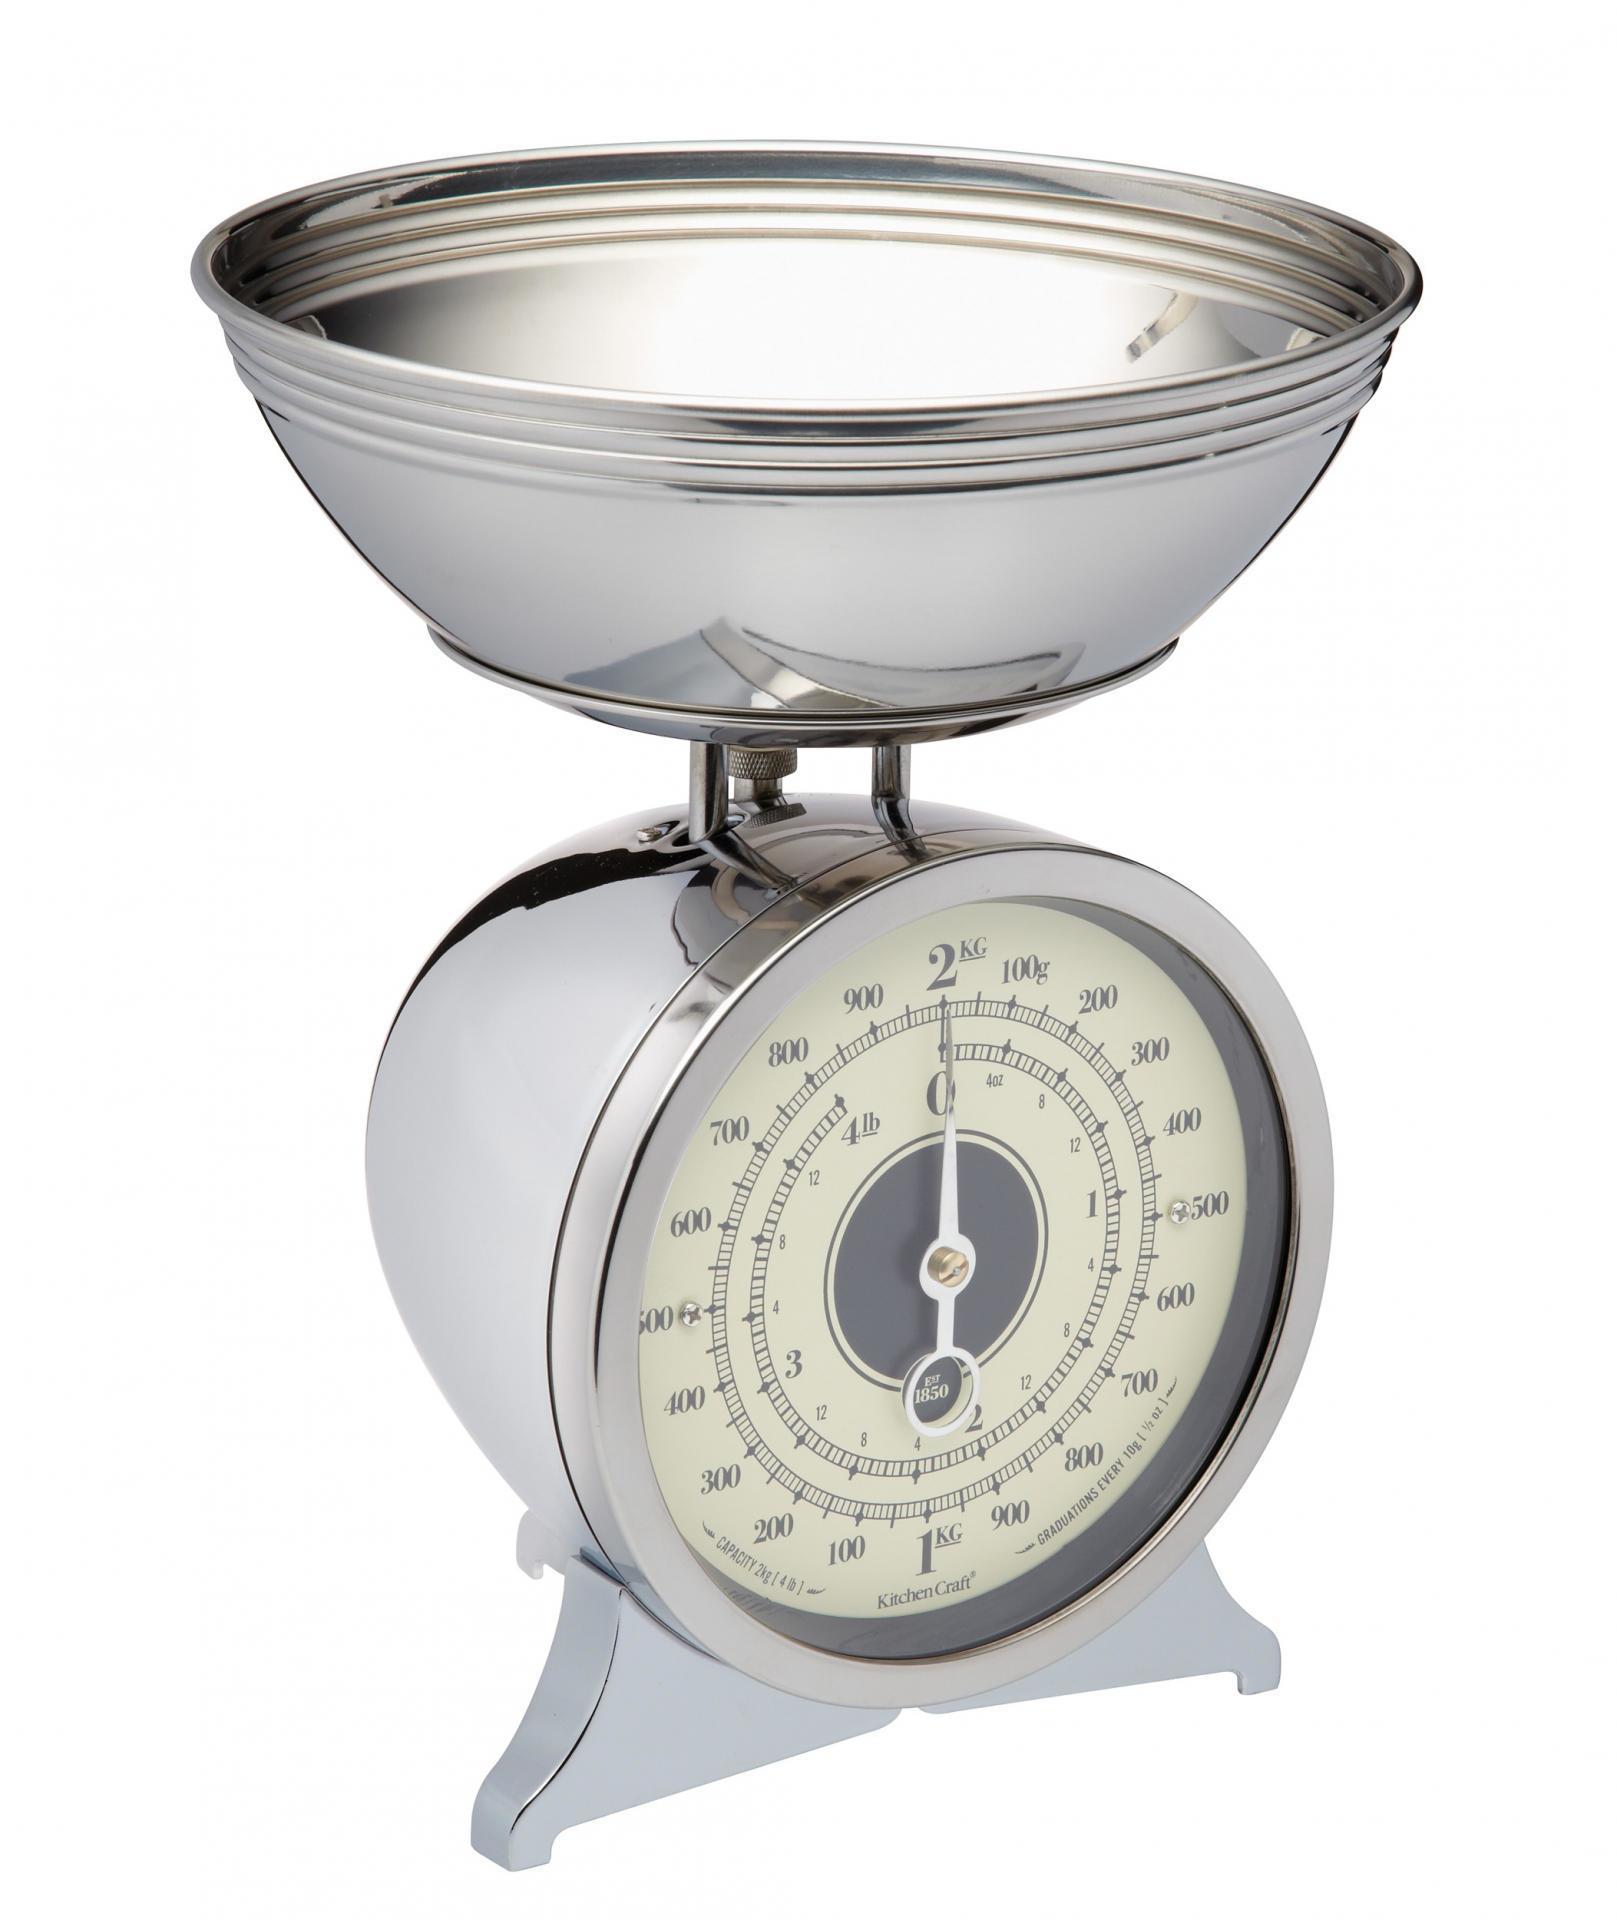 Kitchen Craft Mechanická kuchyňská váha Chrome - 2 kg, stříbrná barva, kov